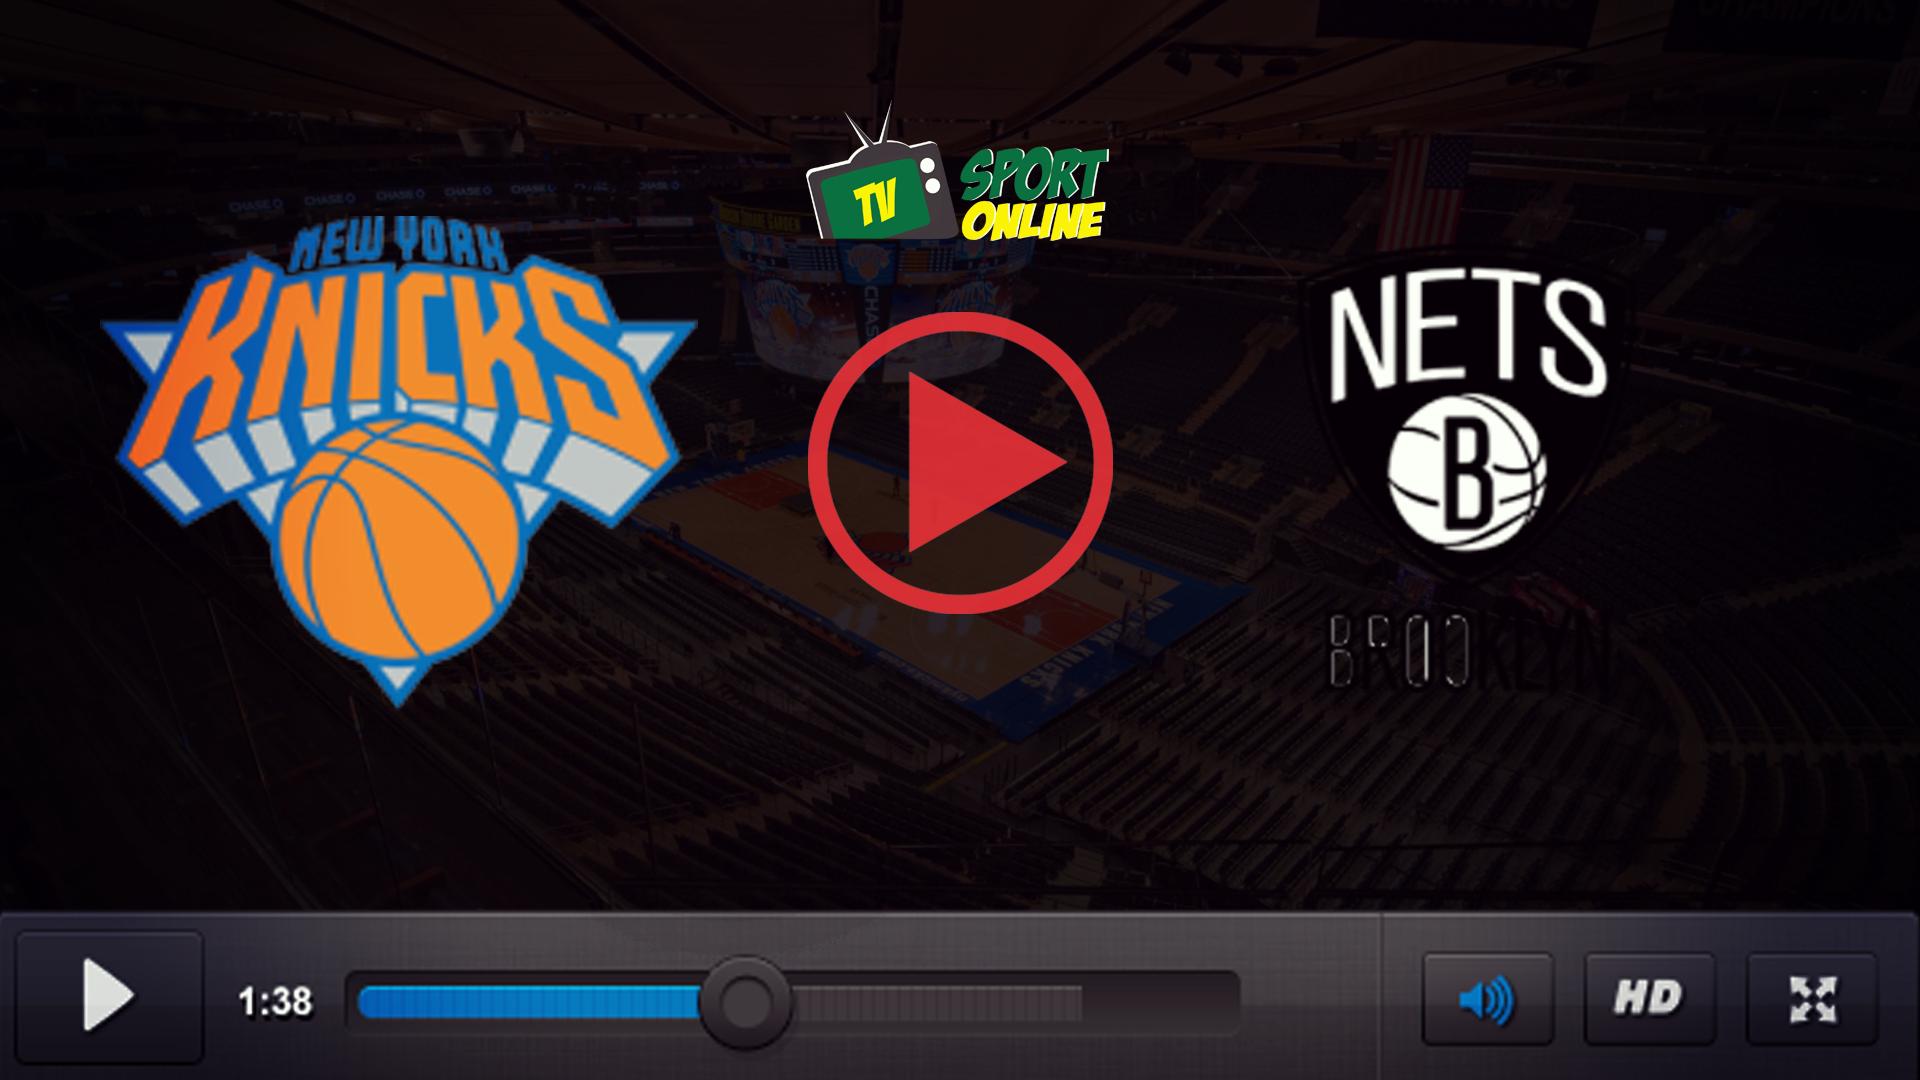 Watch Live Stream New York Knicks – Brooklyn Nets